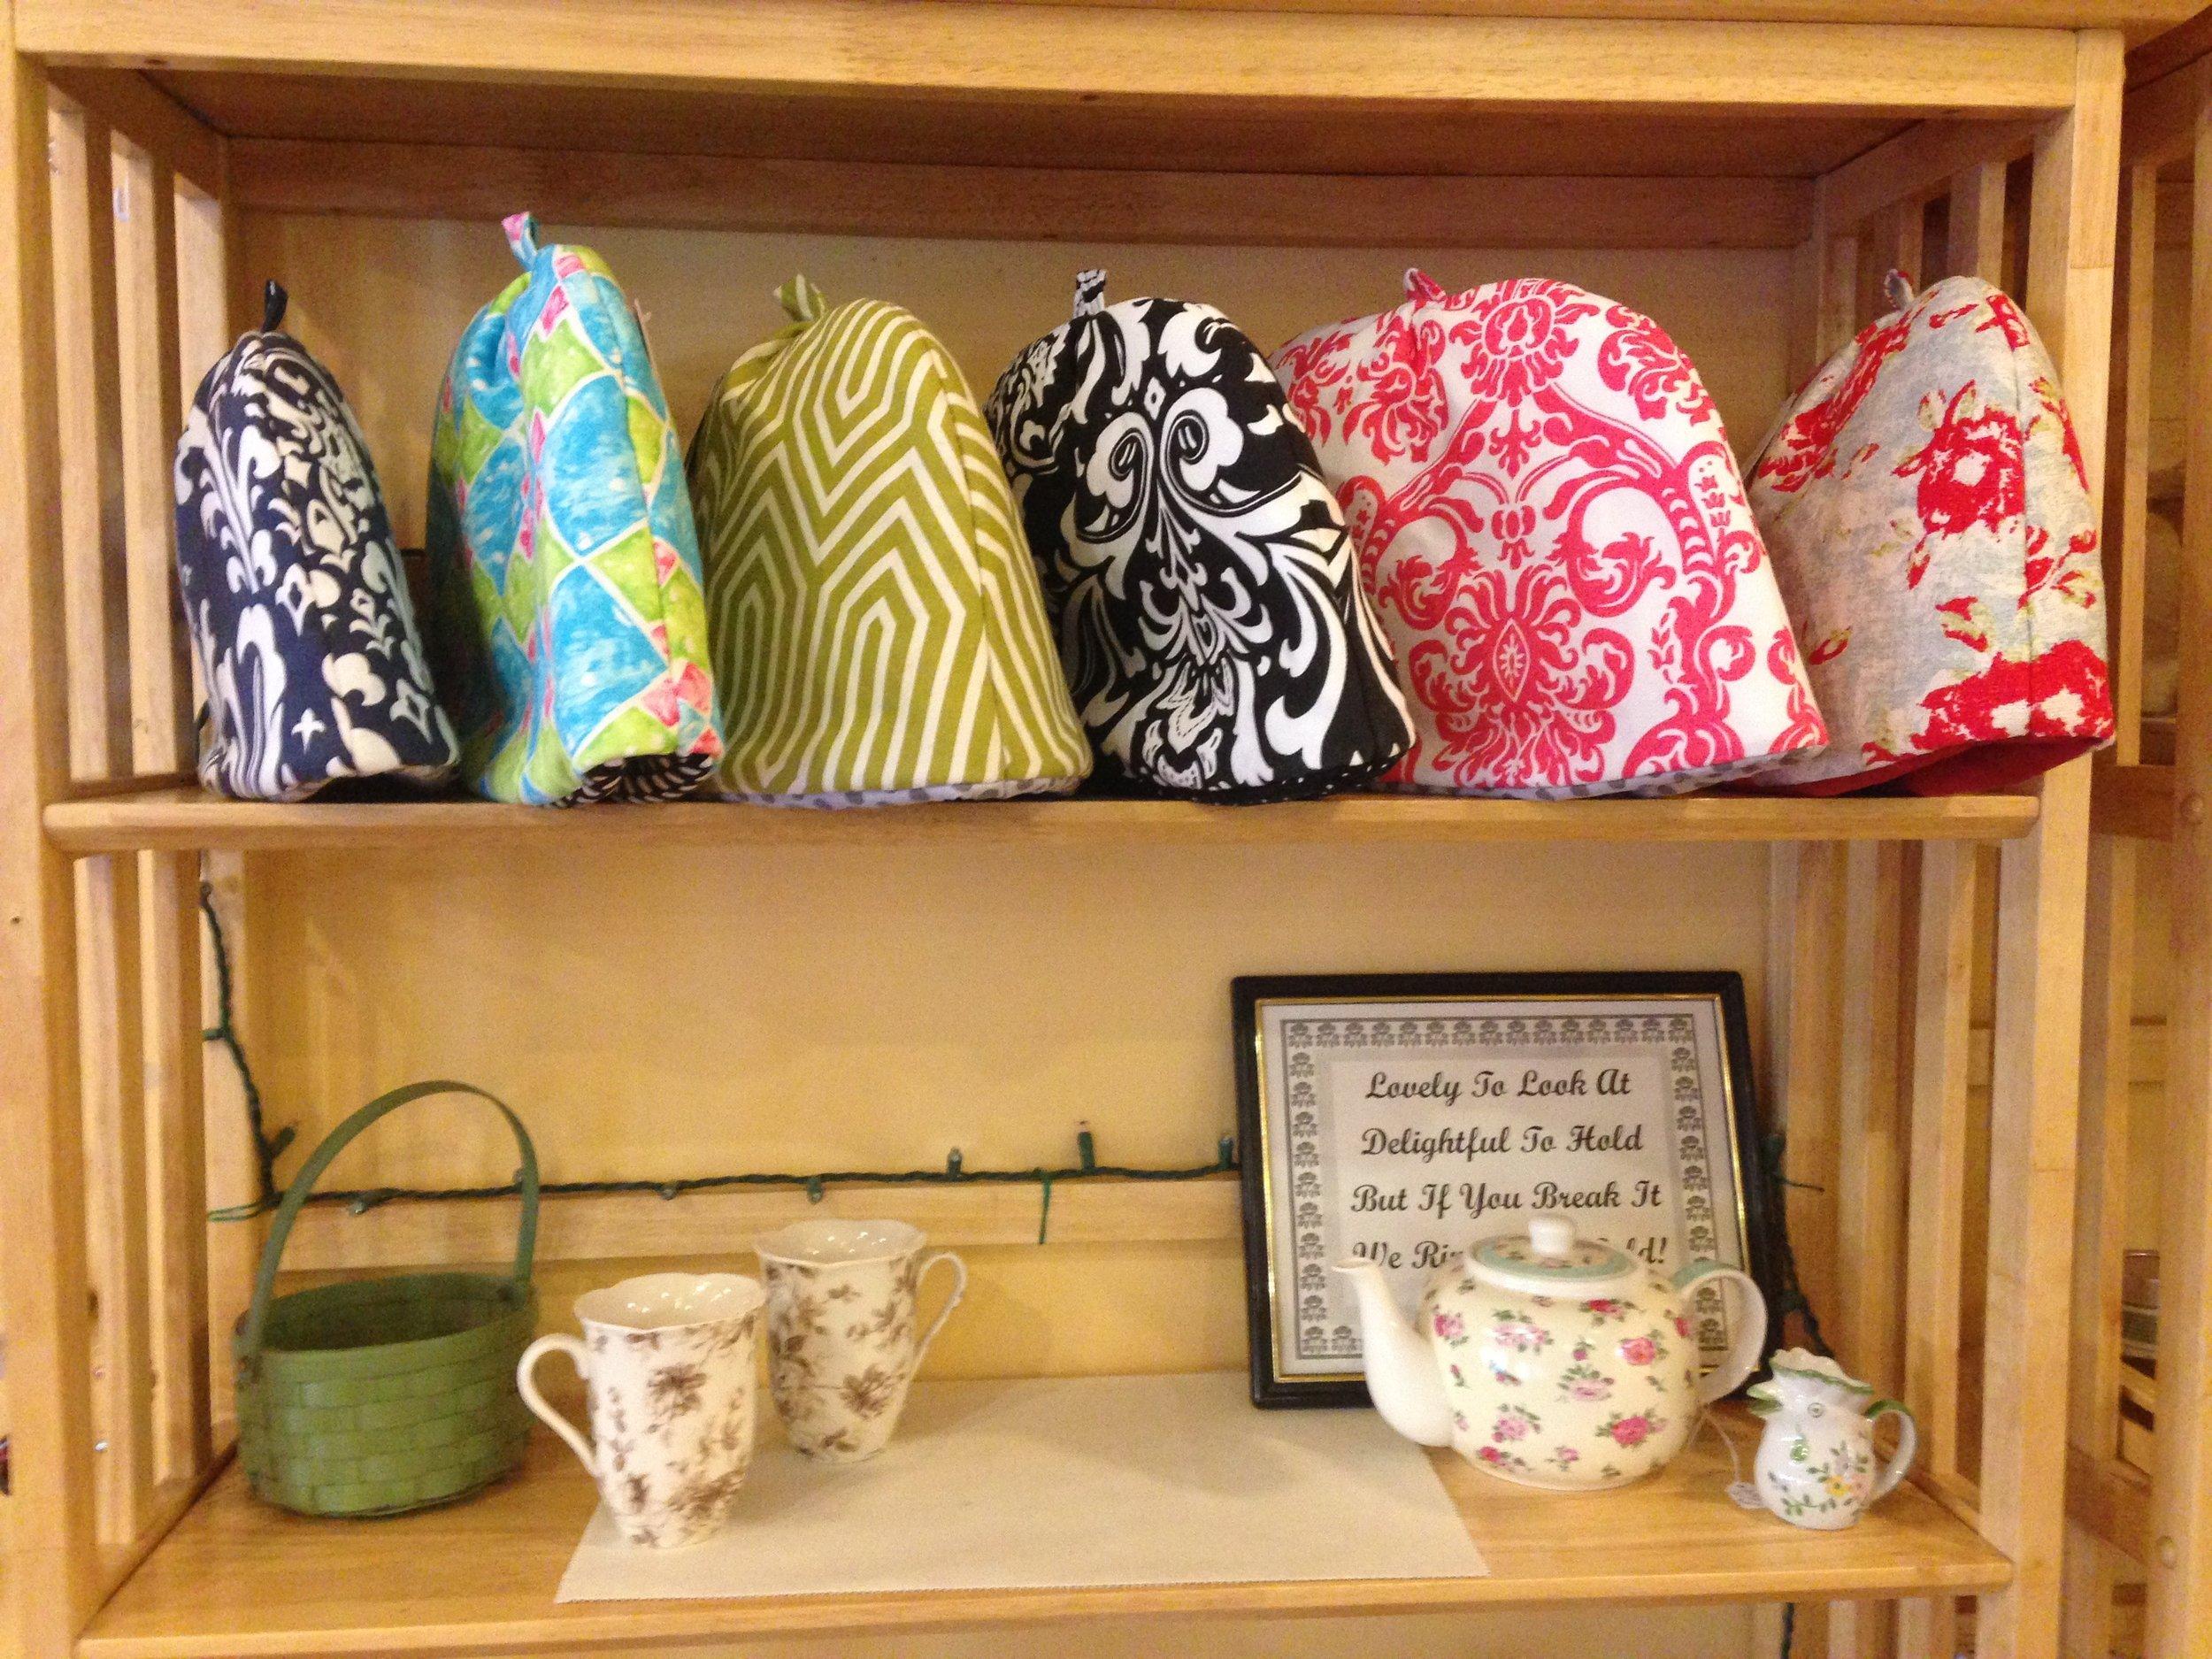 Tea cozies...Don NOT put on head!